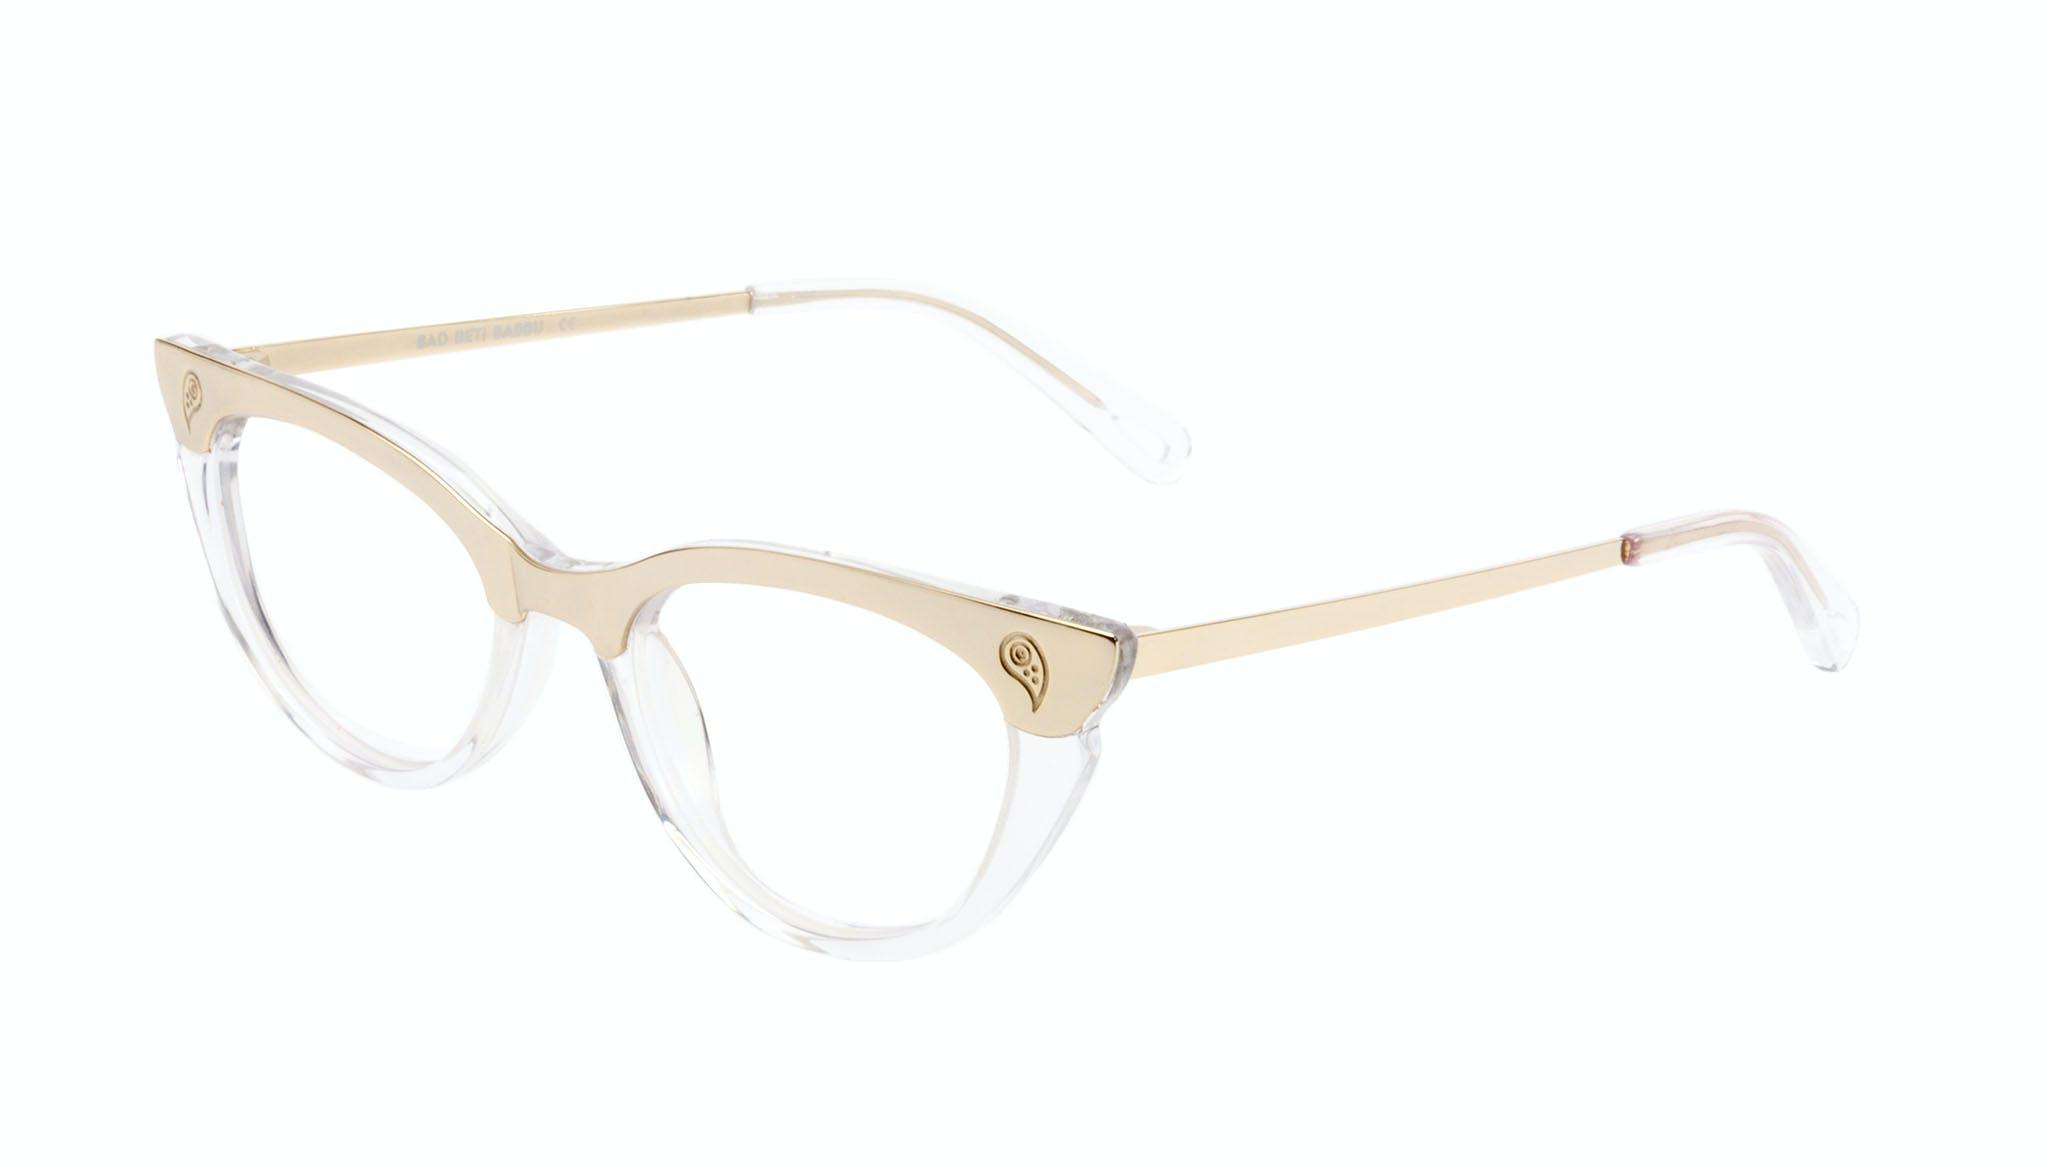 Affordable Fashion Glasses Cat Eye Daring Cateye Eyeglasses Women Bad Beti Babbu Tilt